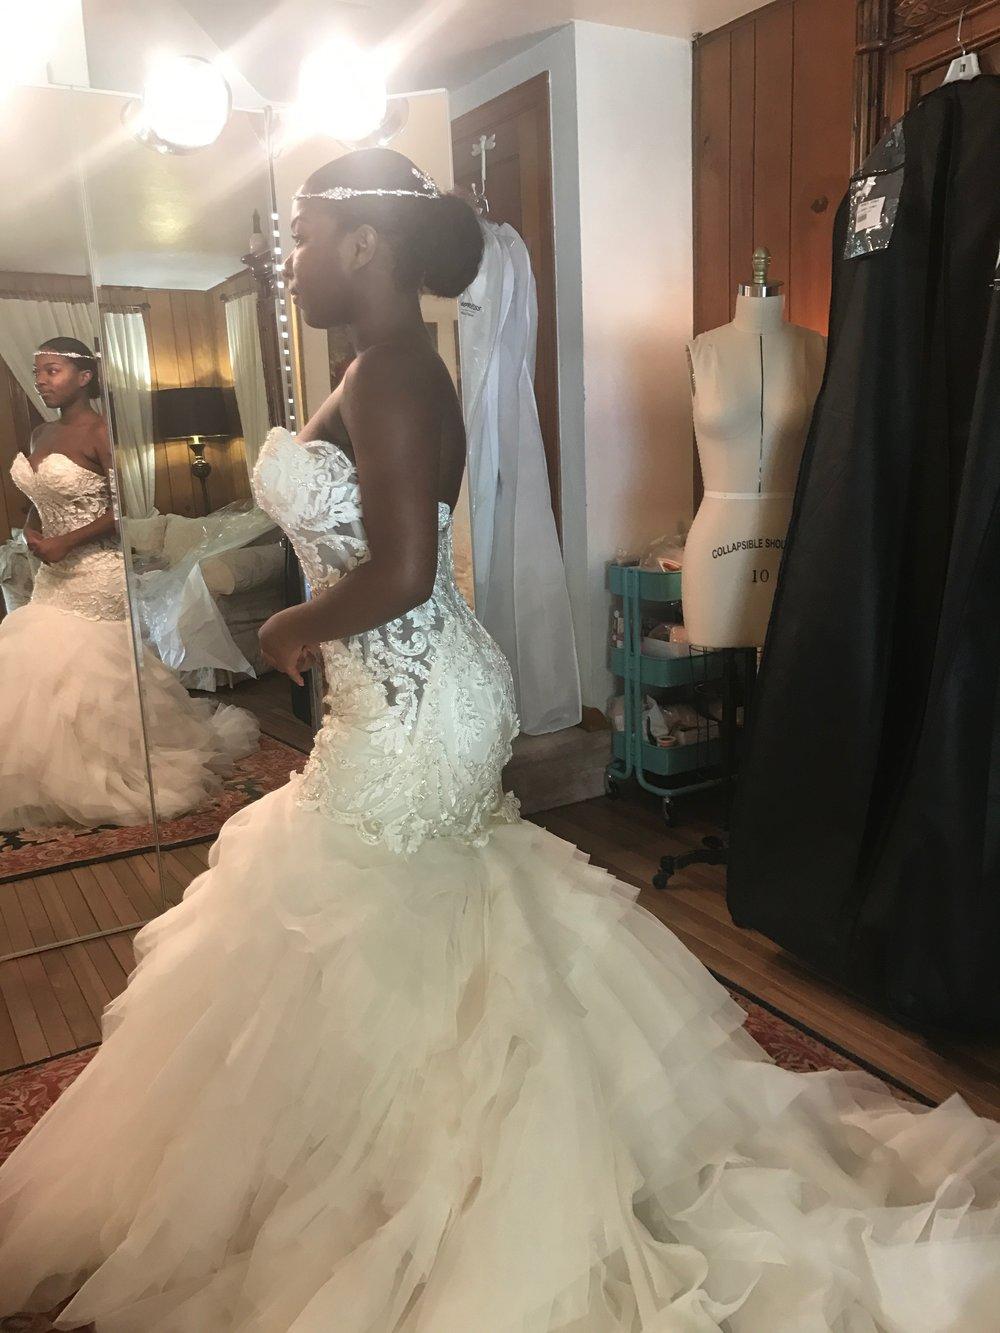 Black Destination Bride - BlackDesti Wedding Journal - Bridefriends Podcast -10 - dress fitting4 - 2 veils.JPG